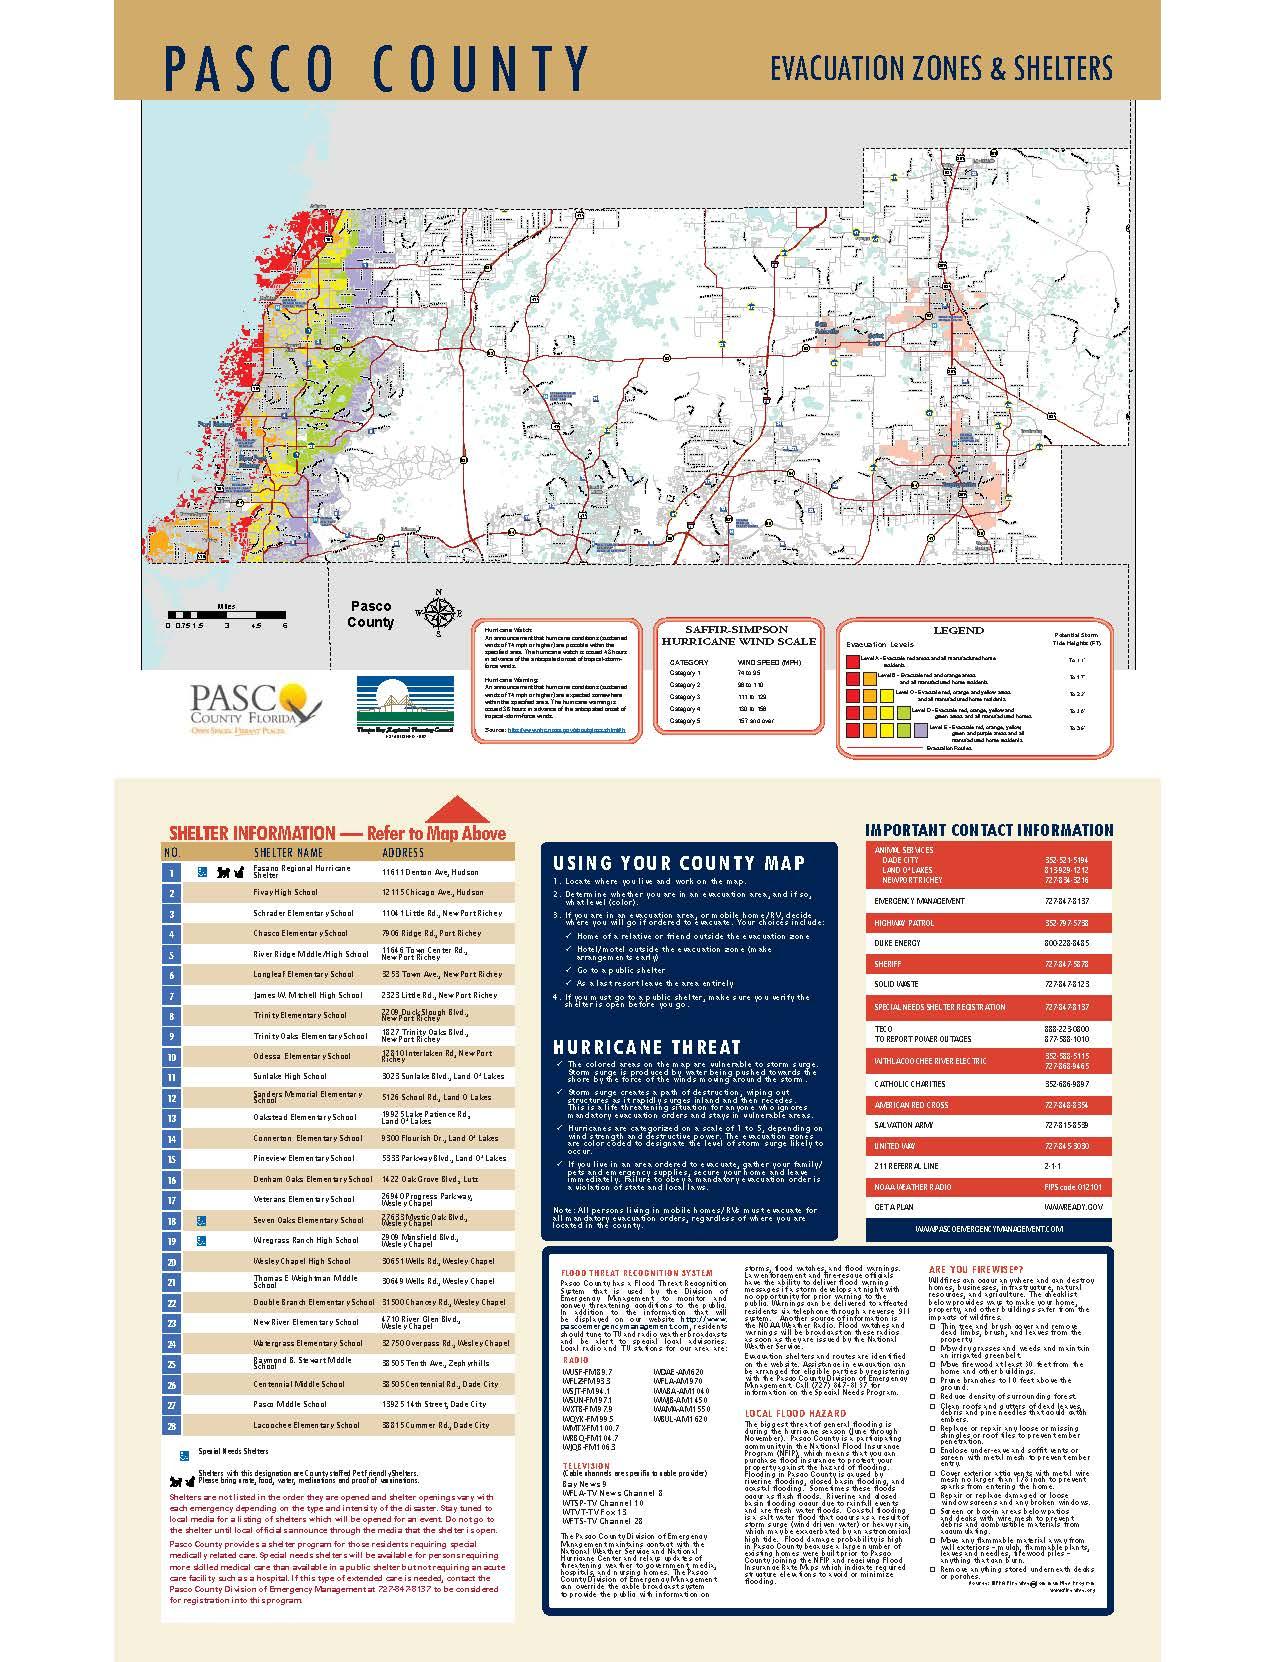 Pasco County Evacuation Zones & Shelters – City of Port Richey